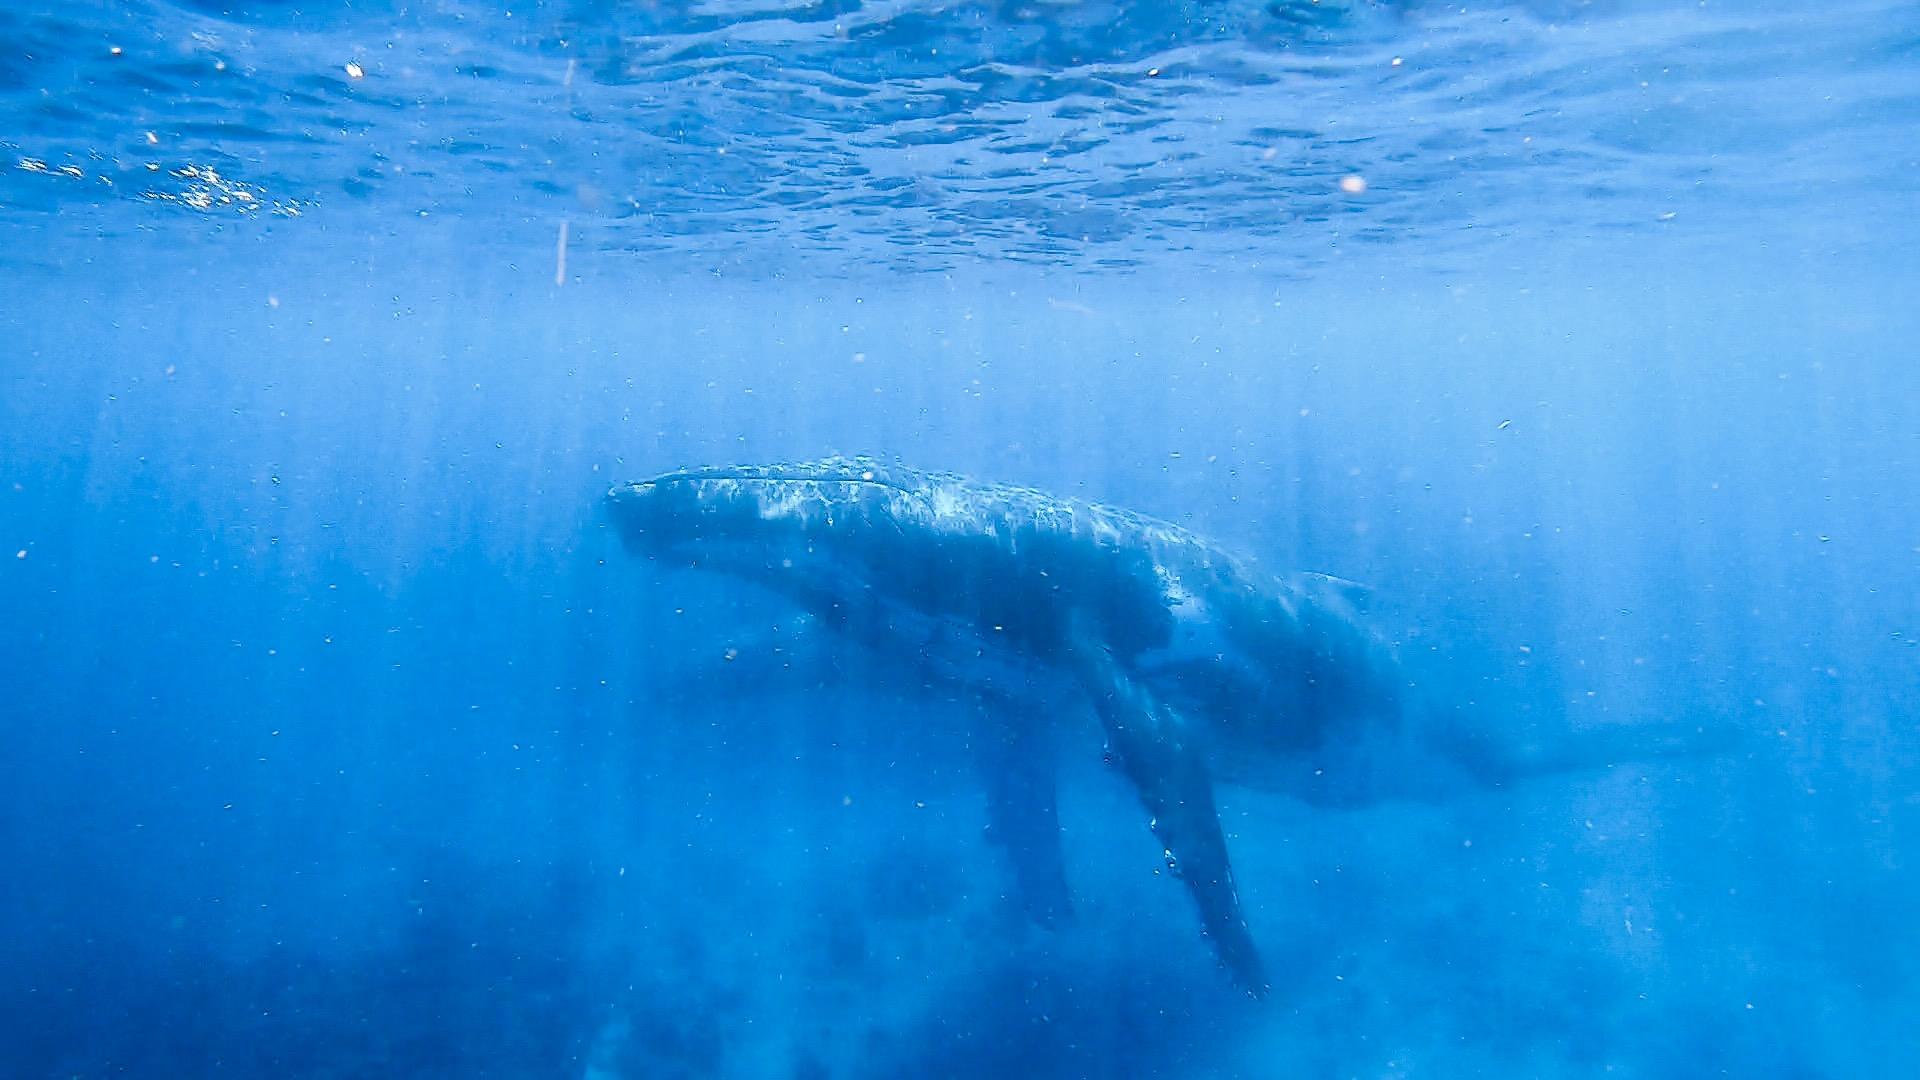 Male Escort with Mom and Calf Behind - Humpback Whales in Ha'apai, Tonga